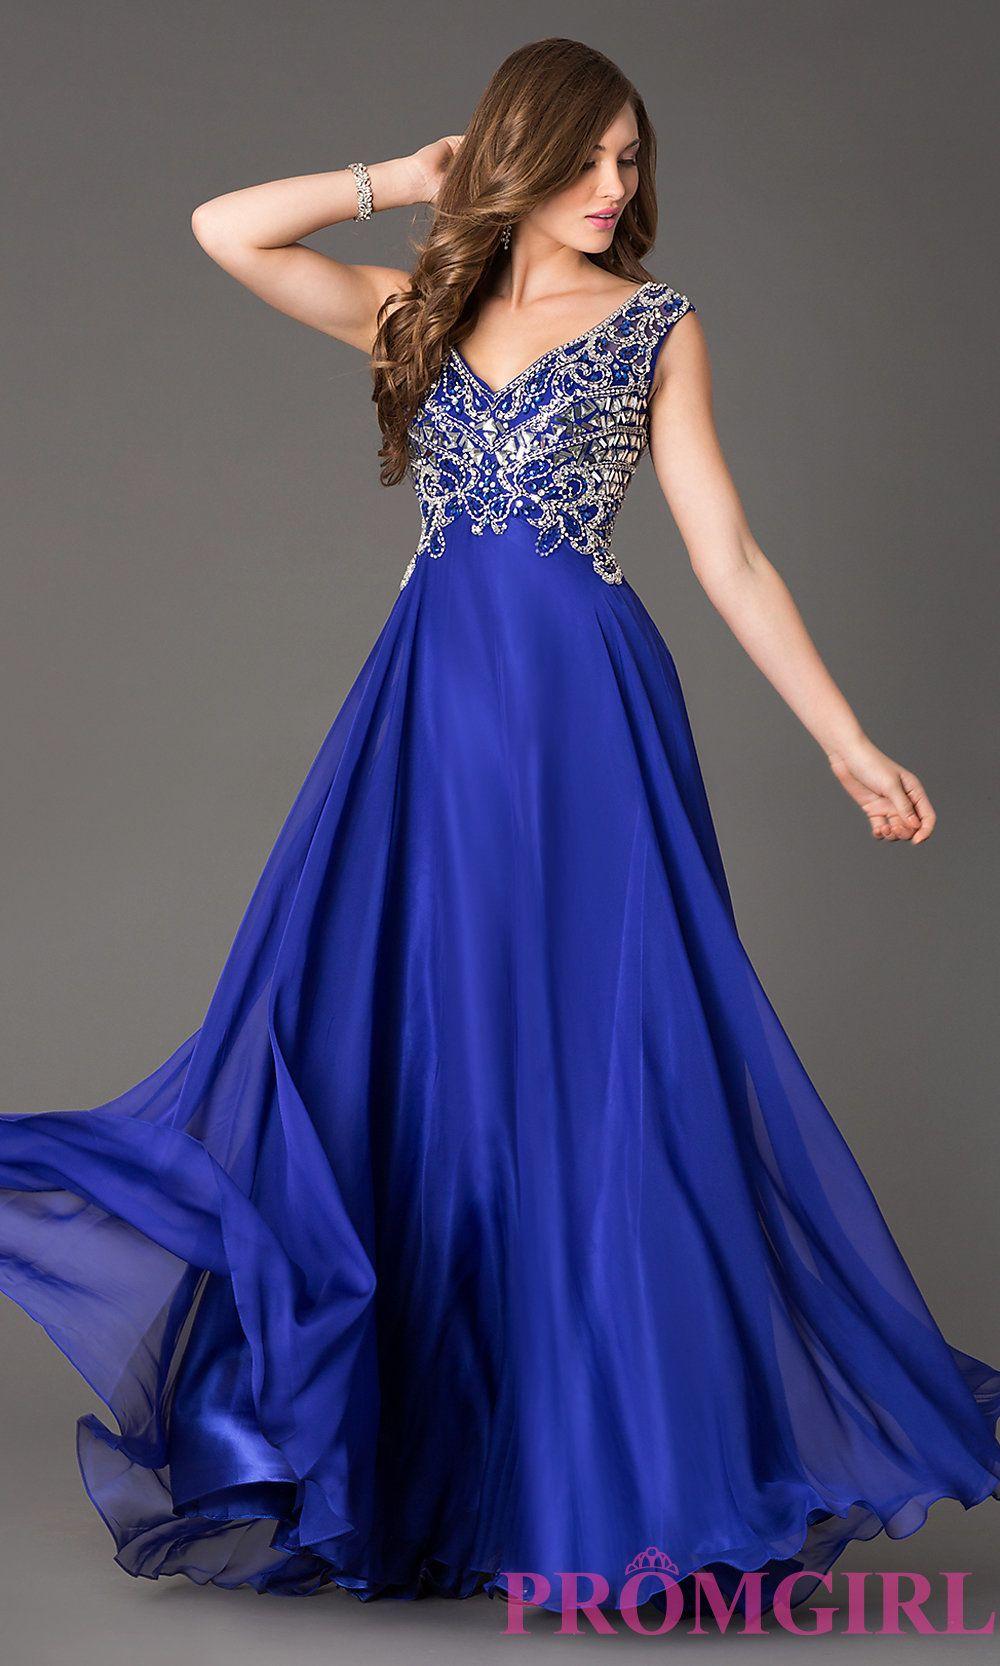 V neck blue dress plus